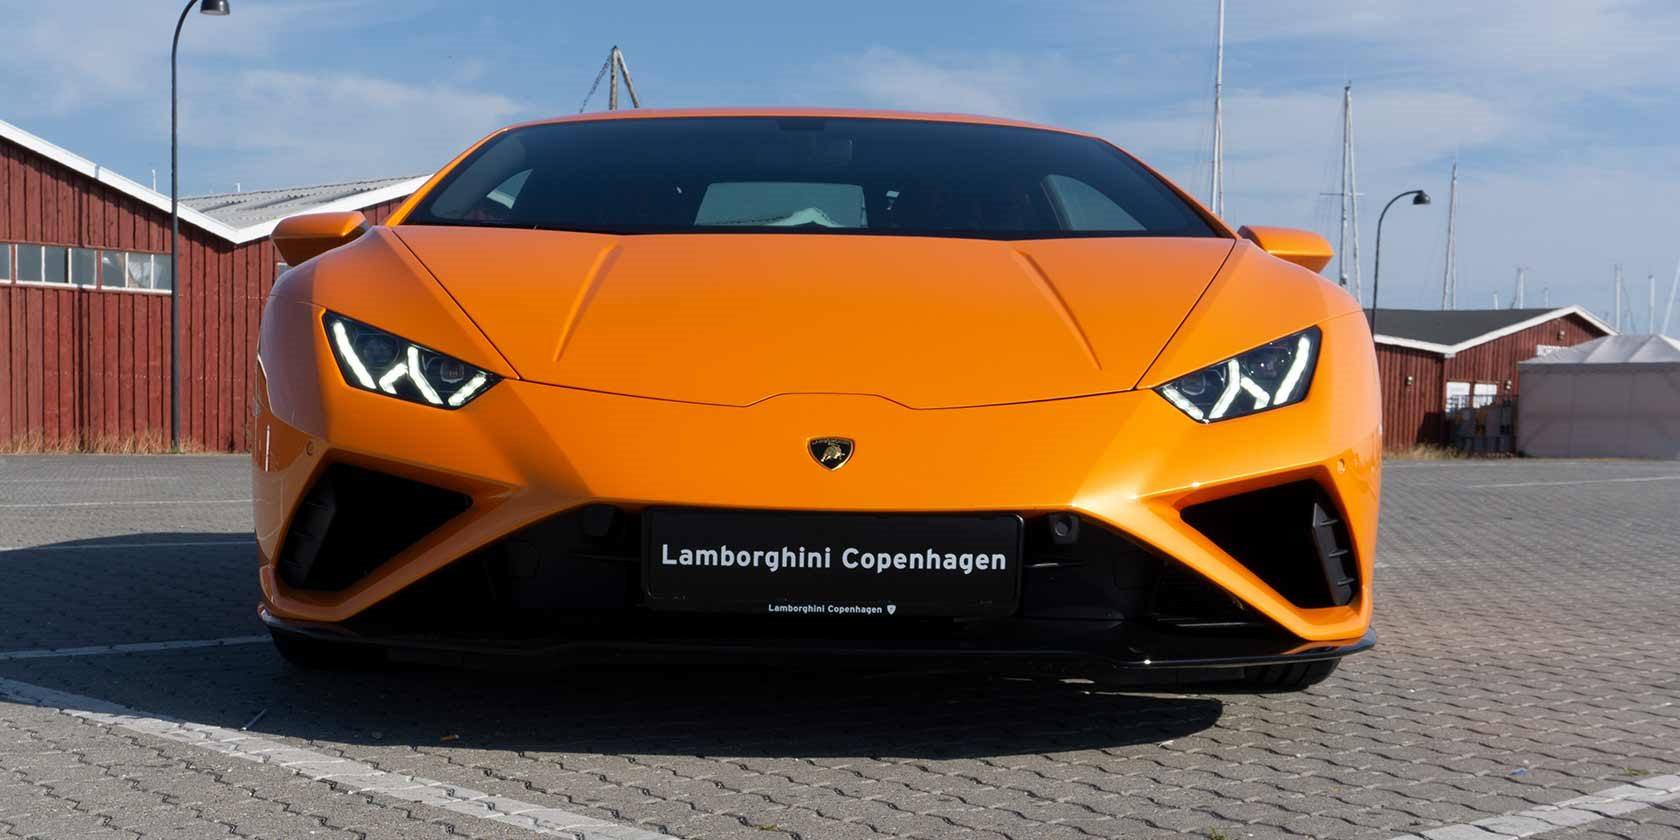 KAUFMANN_1680x840_Lamborghini_thejournal_04.jpg